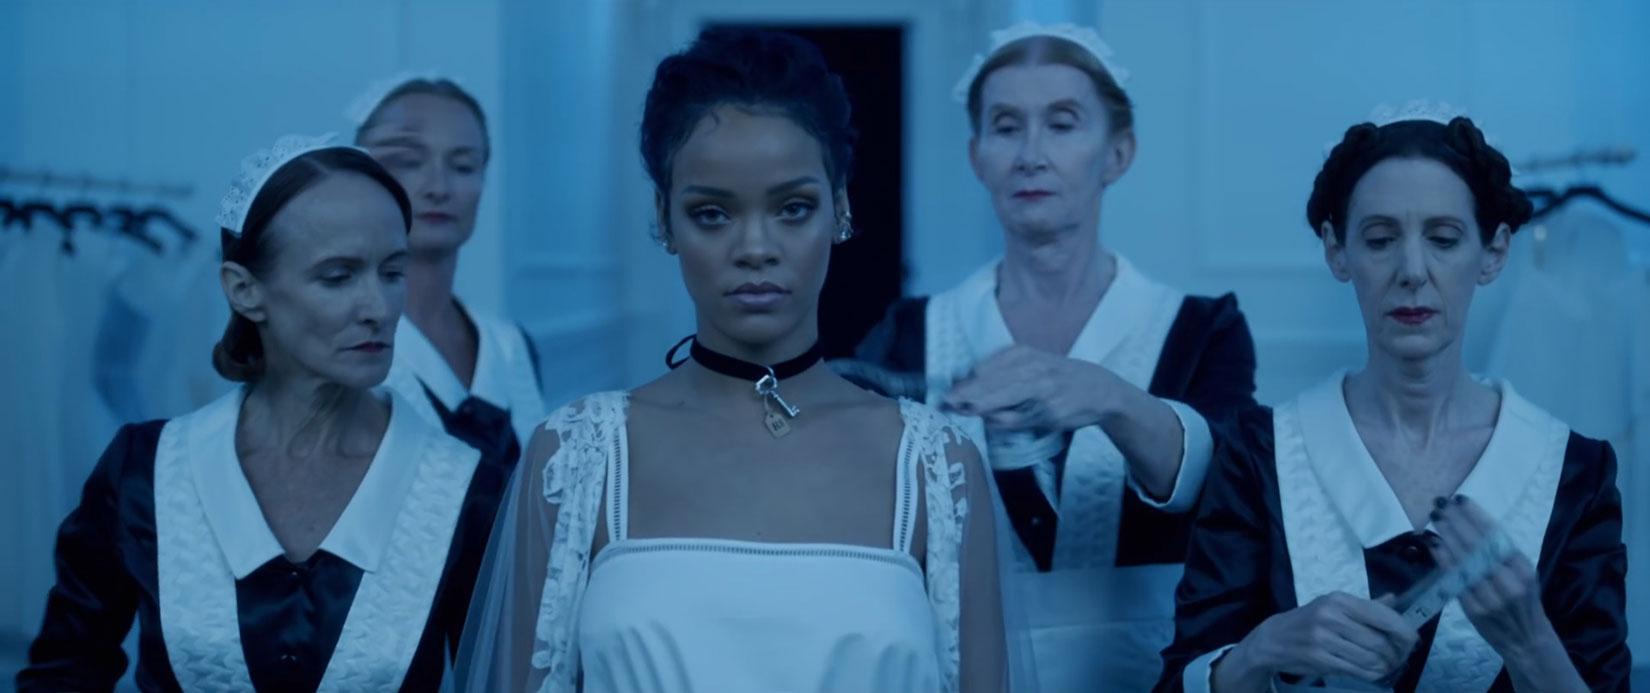 Rihanna_ANTI_diaRy_2